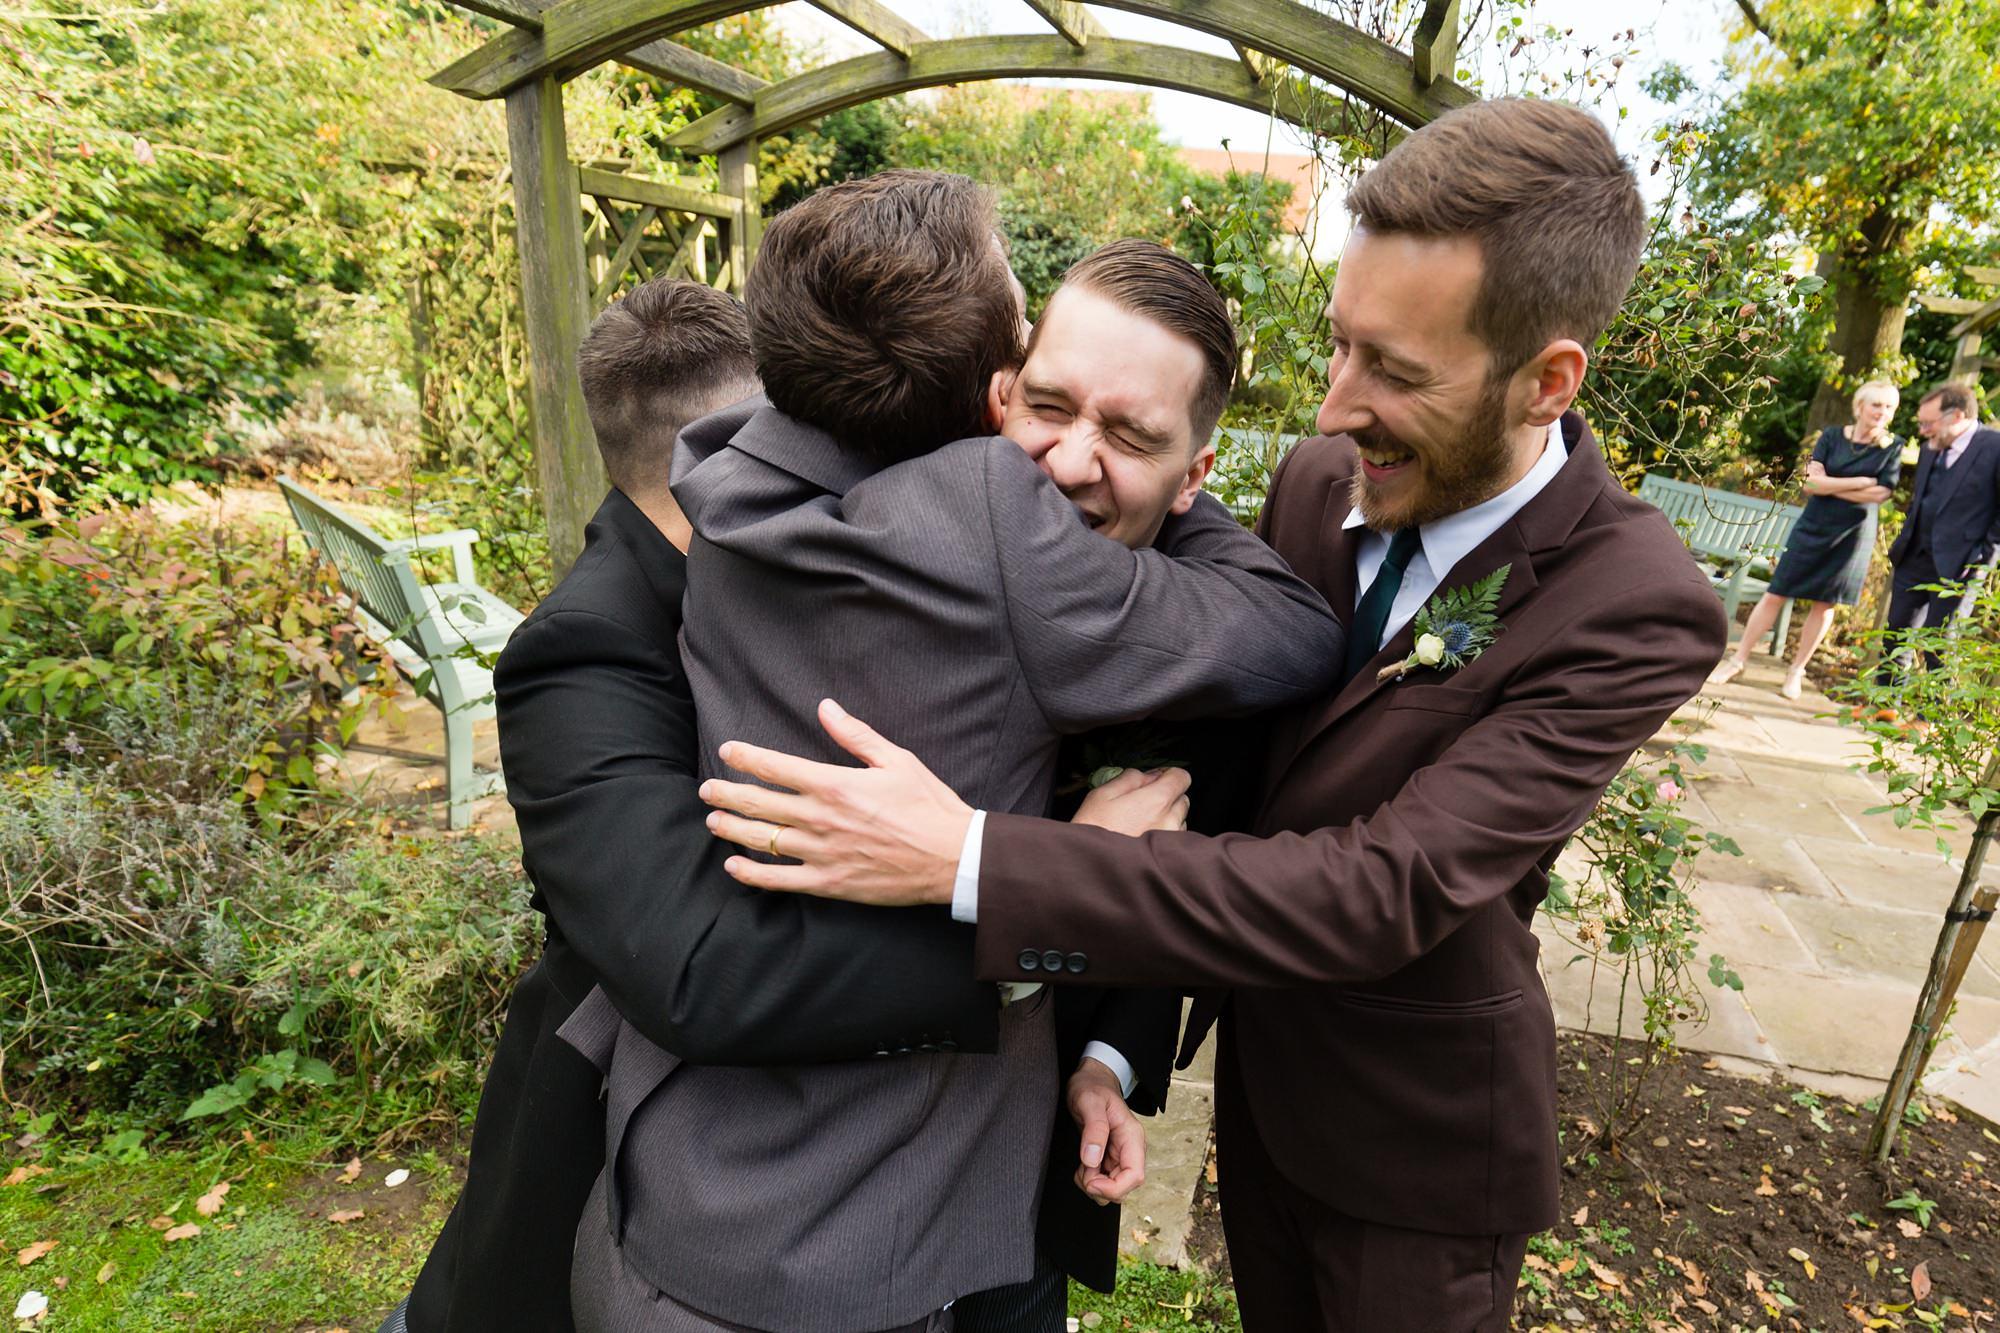 Groomsmen hug groom making him laugh Sandburn Hall Wedding Photography